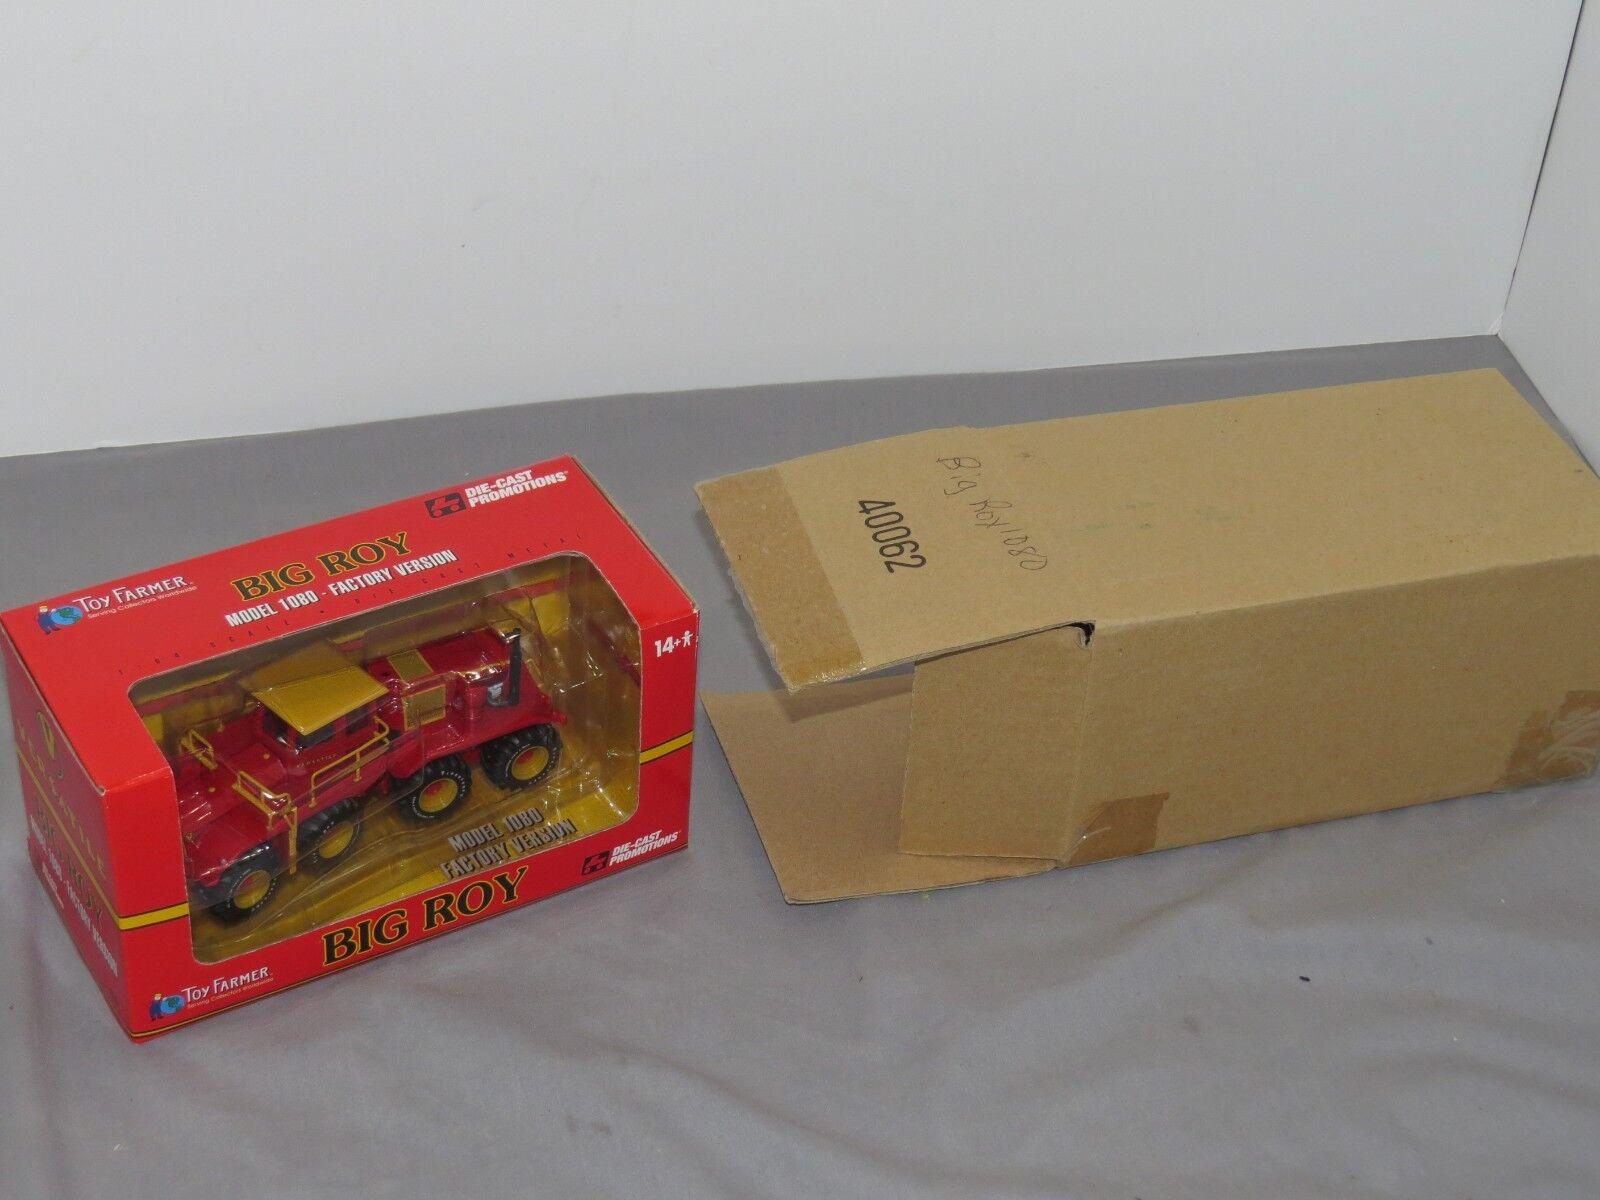 RARE! 1/64 Versatile Big Roy 1080 Tractor Factory Version DCP NIB Shipping box